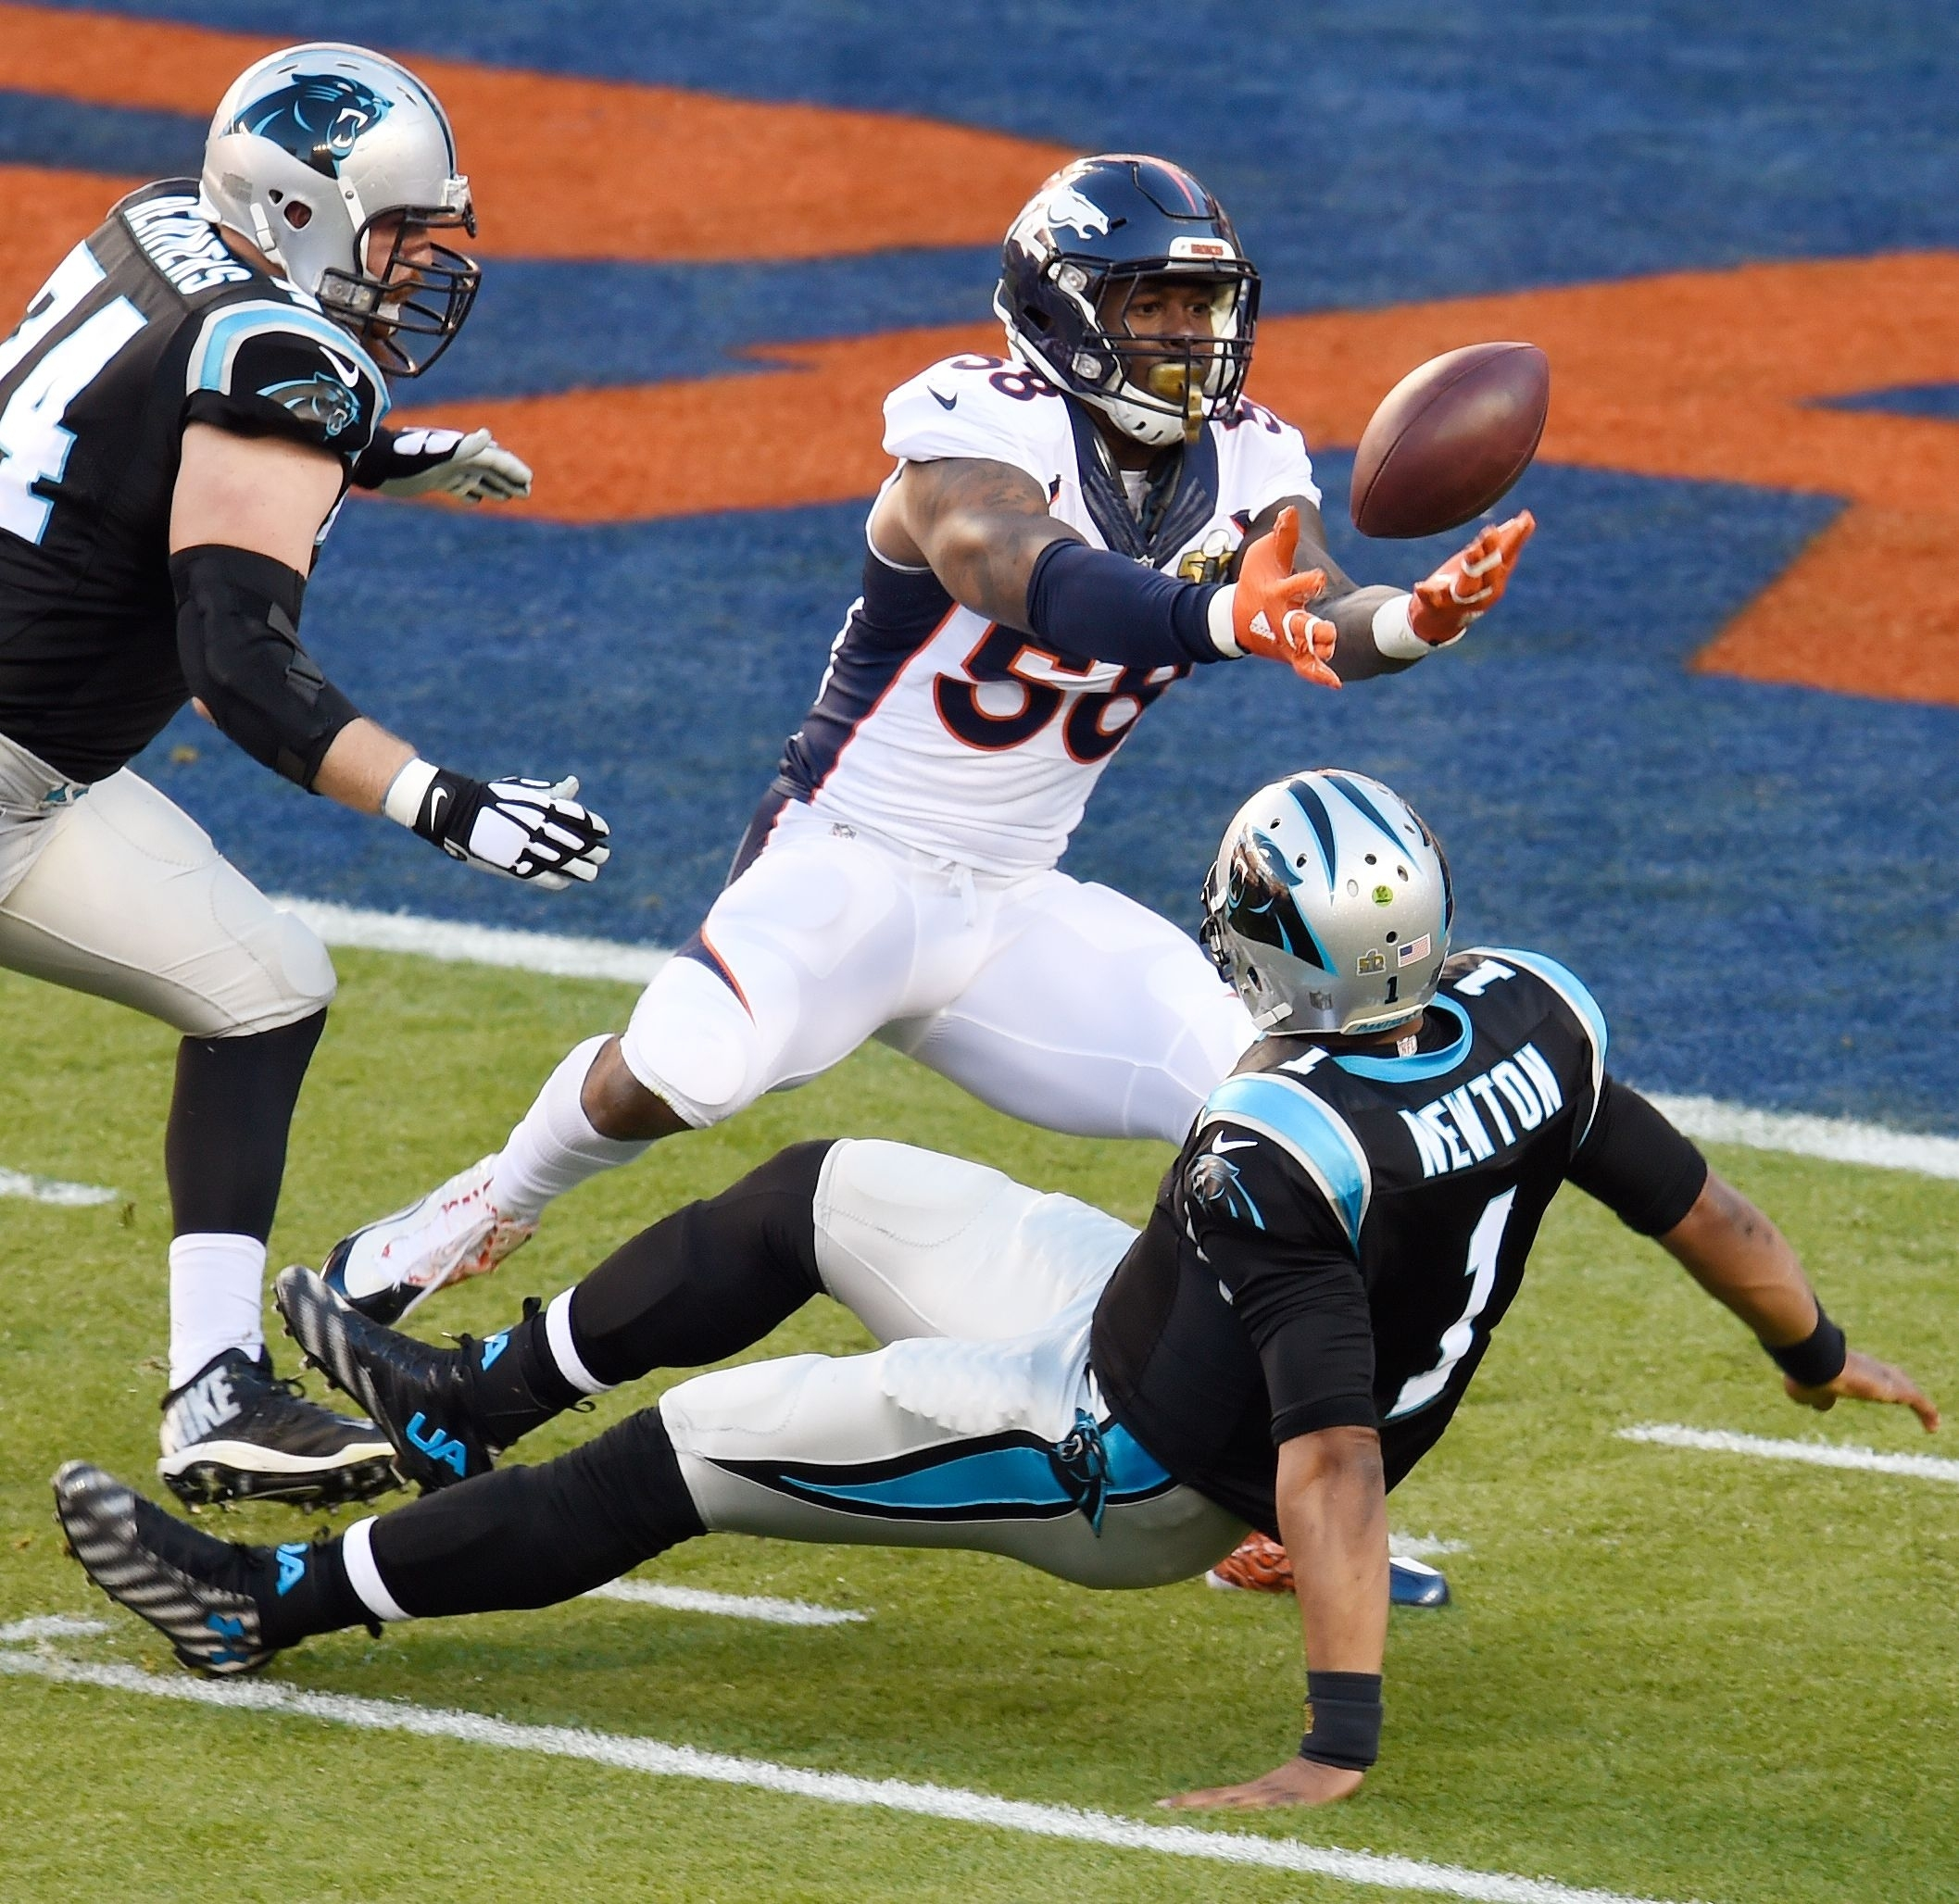 Cam Newton Fumble - Super Bowl 50 In Pictures - Espn within Cam Newton Super Bowl